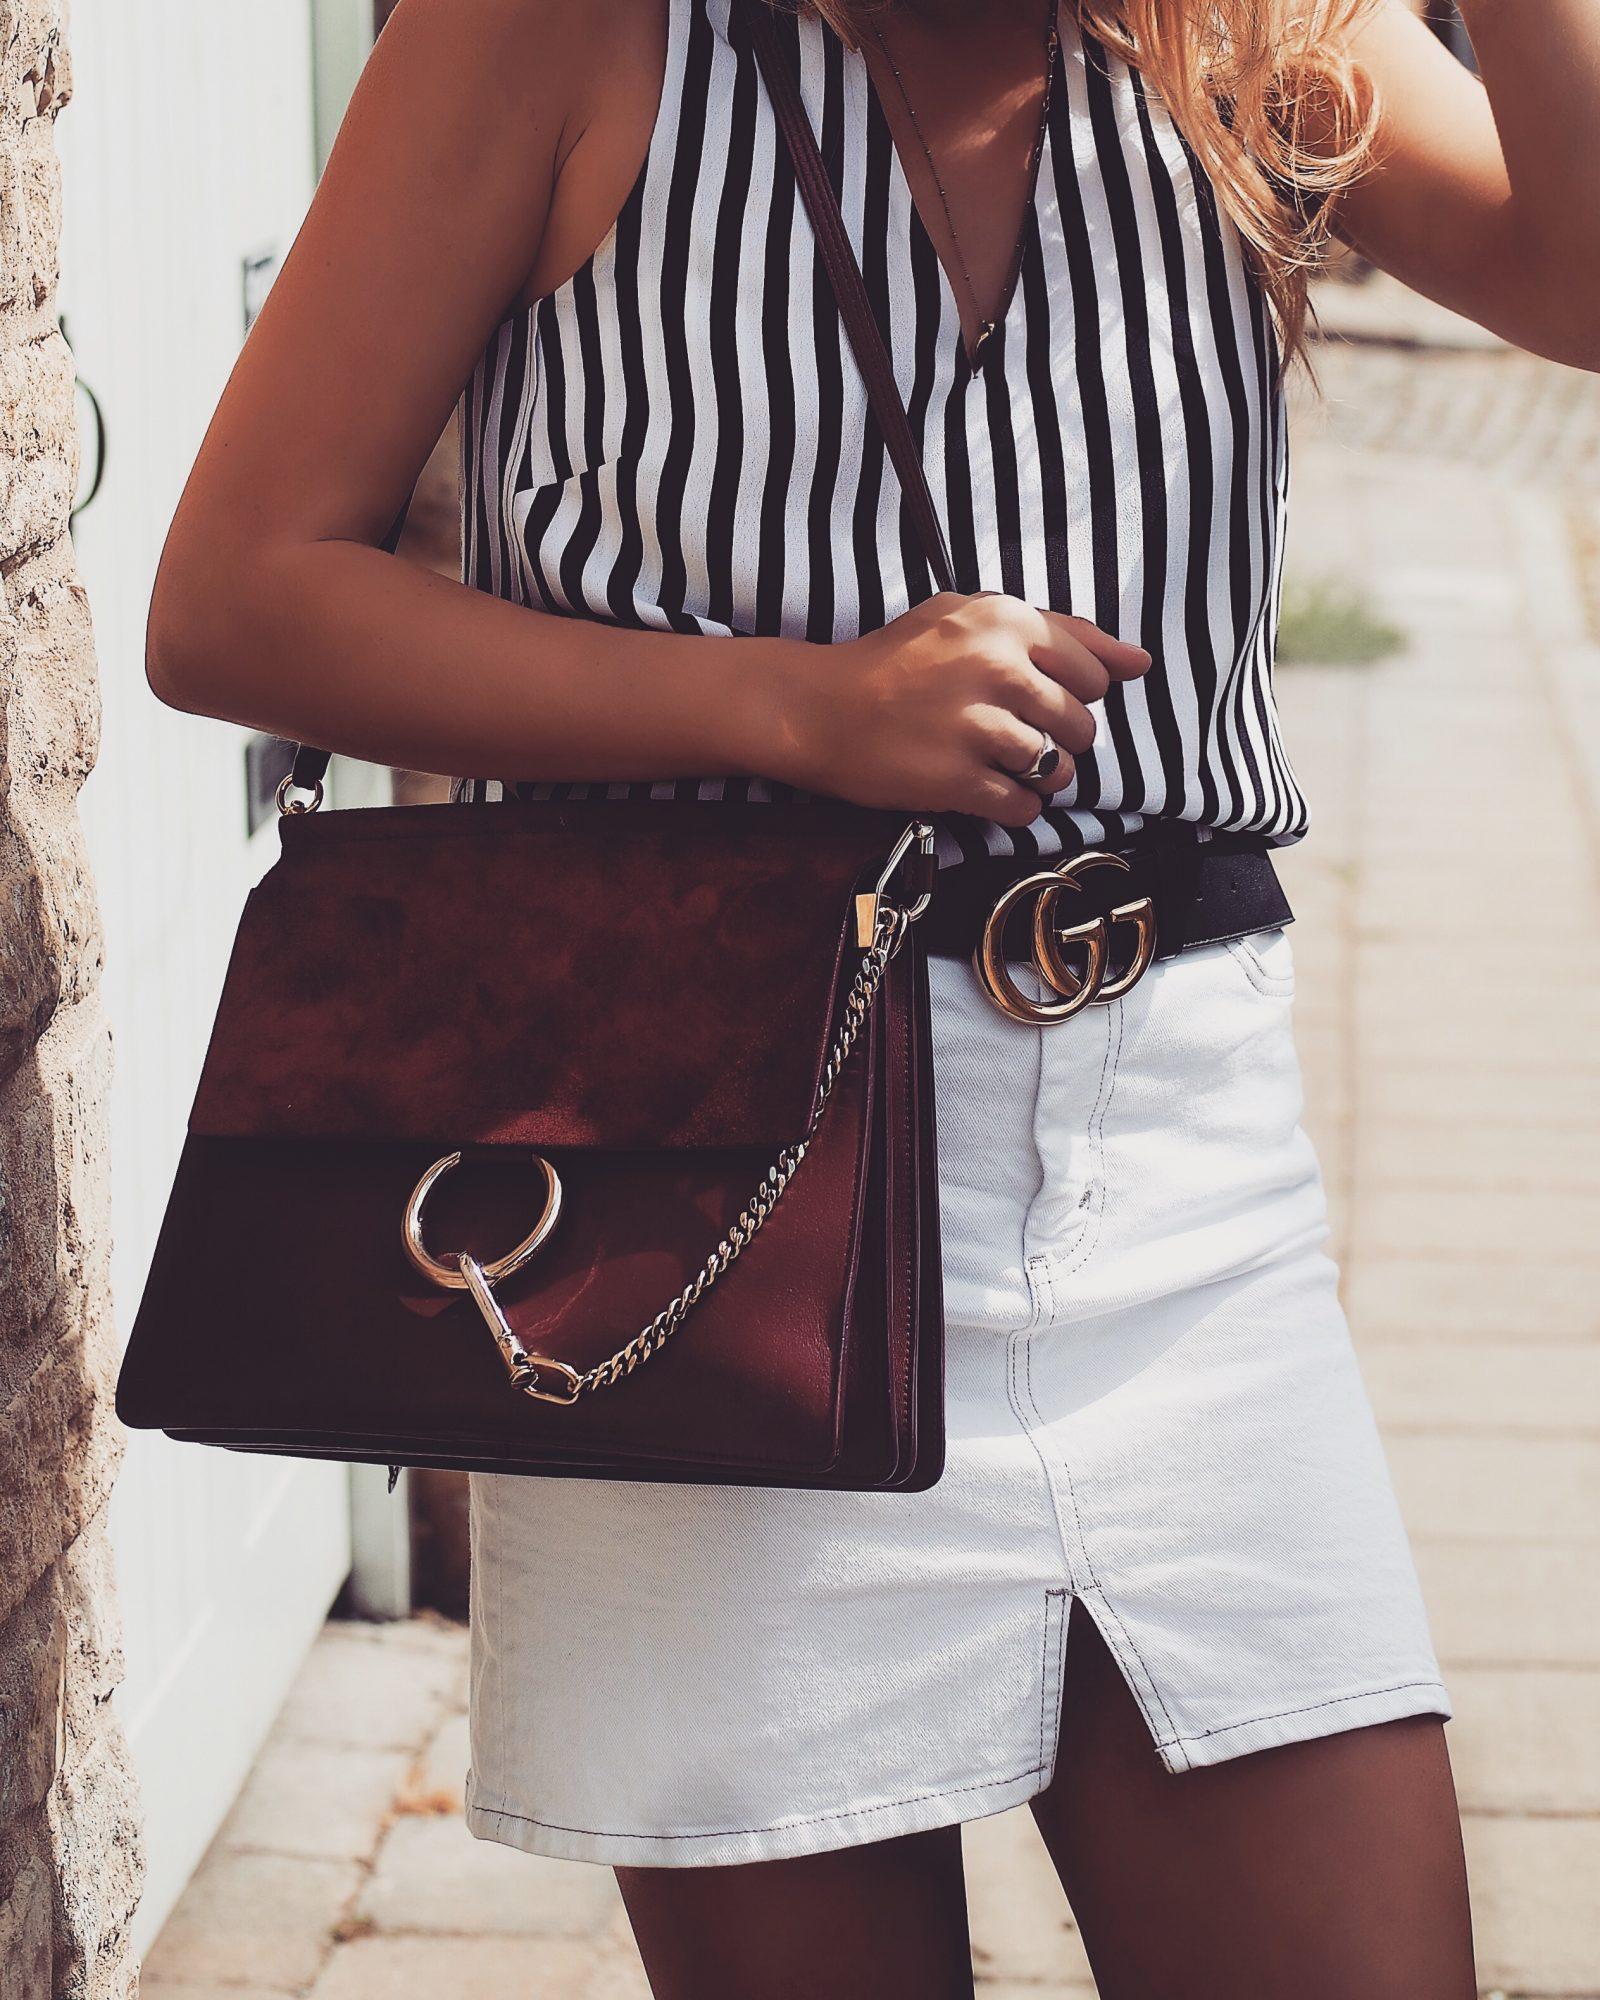 Monochrome Summer Outfit - Chloe Faye Medium Burgundy